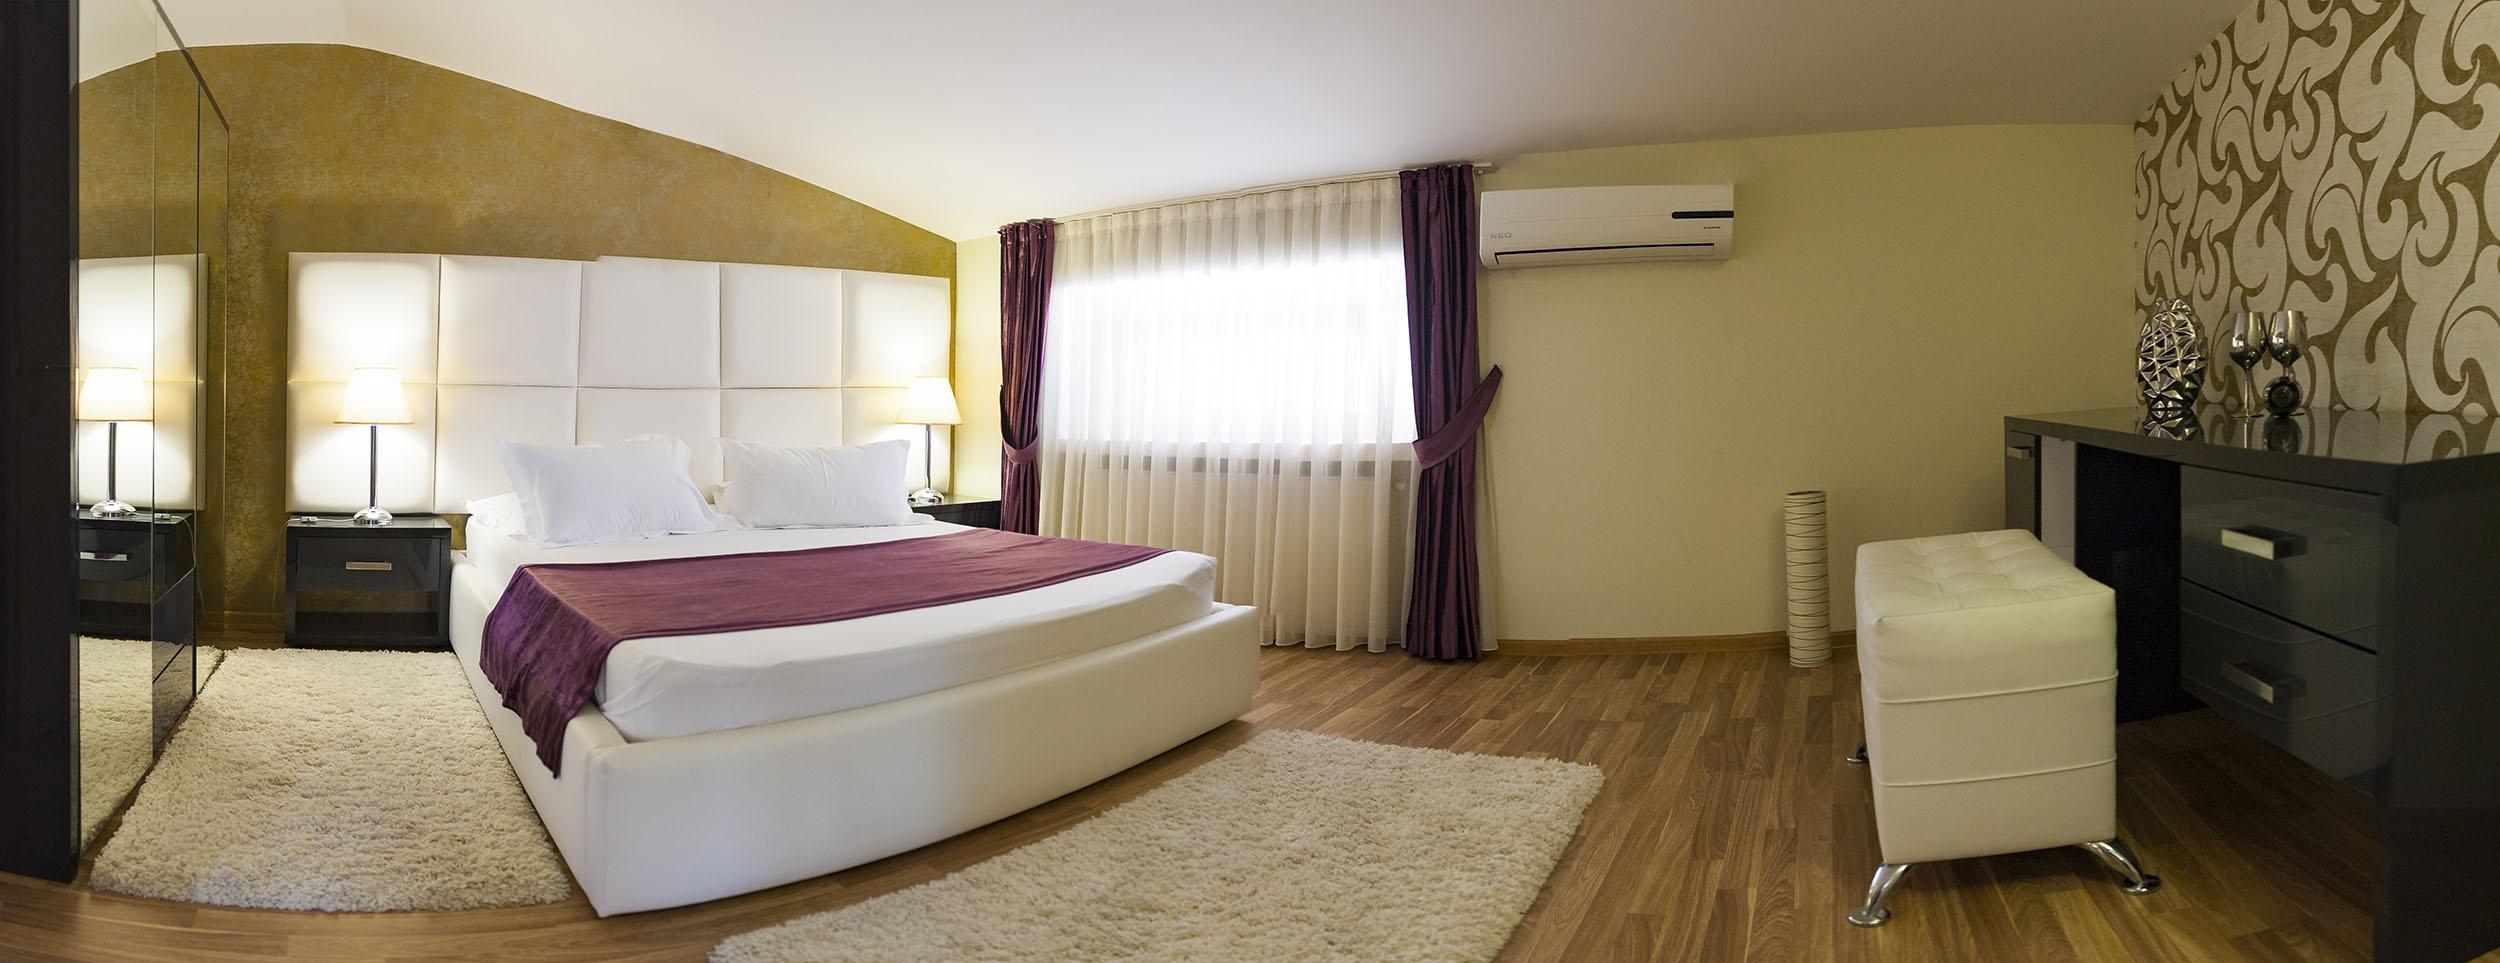 dormitor apartament hotel